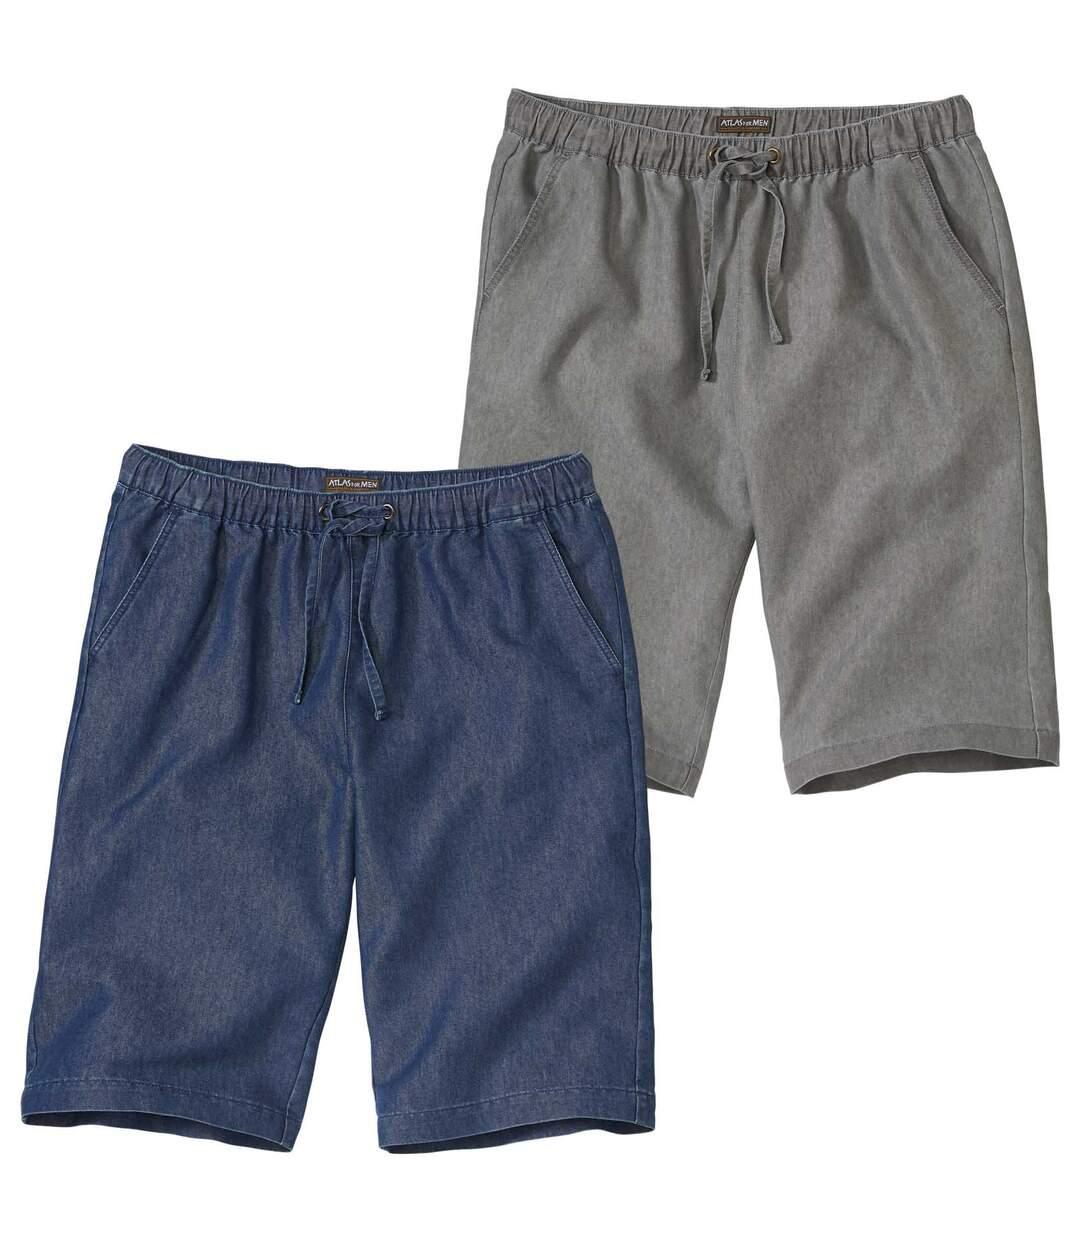 Pack of 2 Pairs of Men's Casual BermudaShorts - Blue Grey